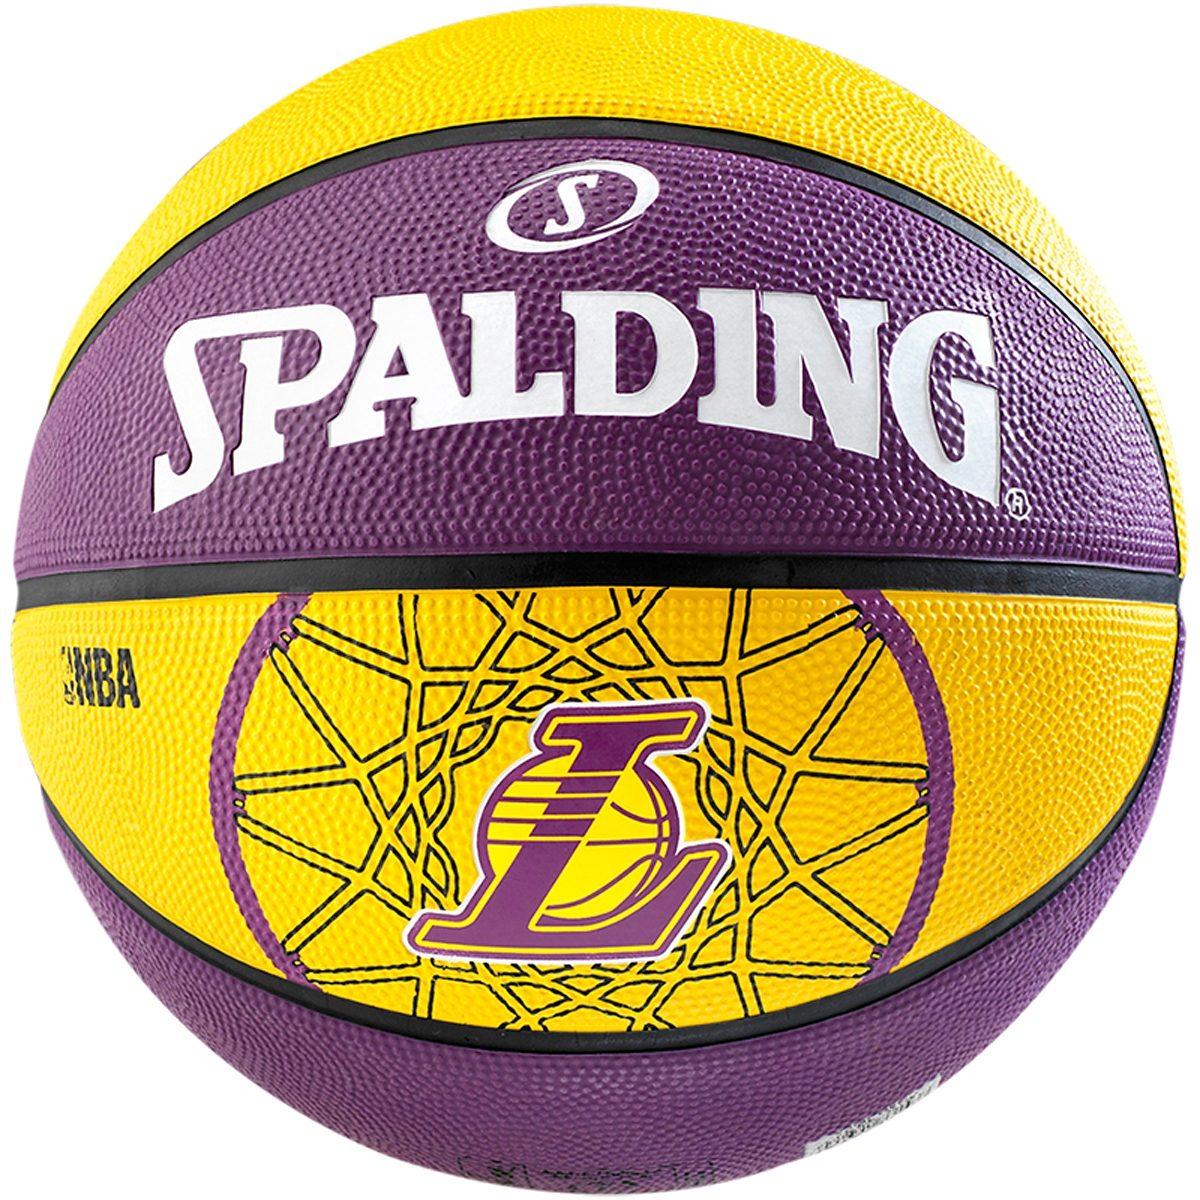 SPALDING Team Los Angeles Lakers Basketball